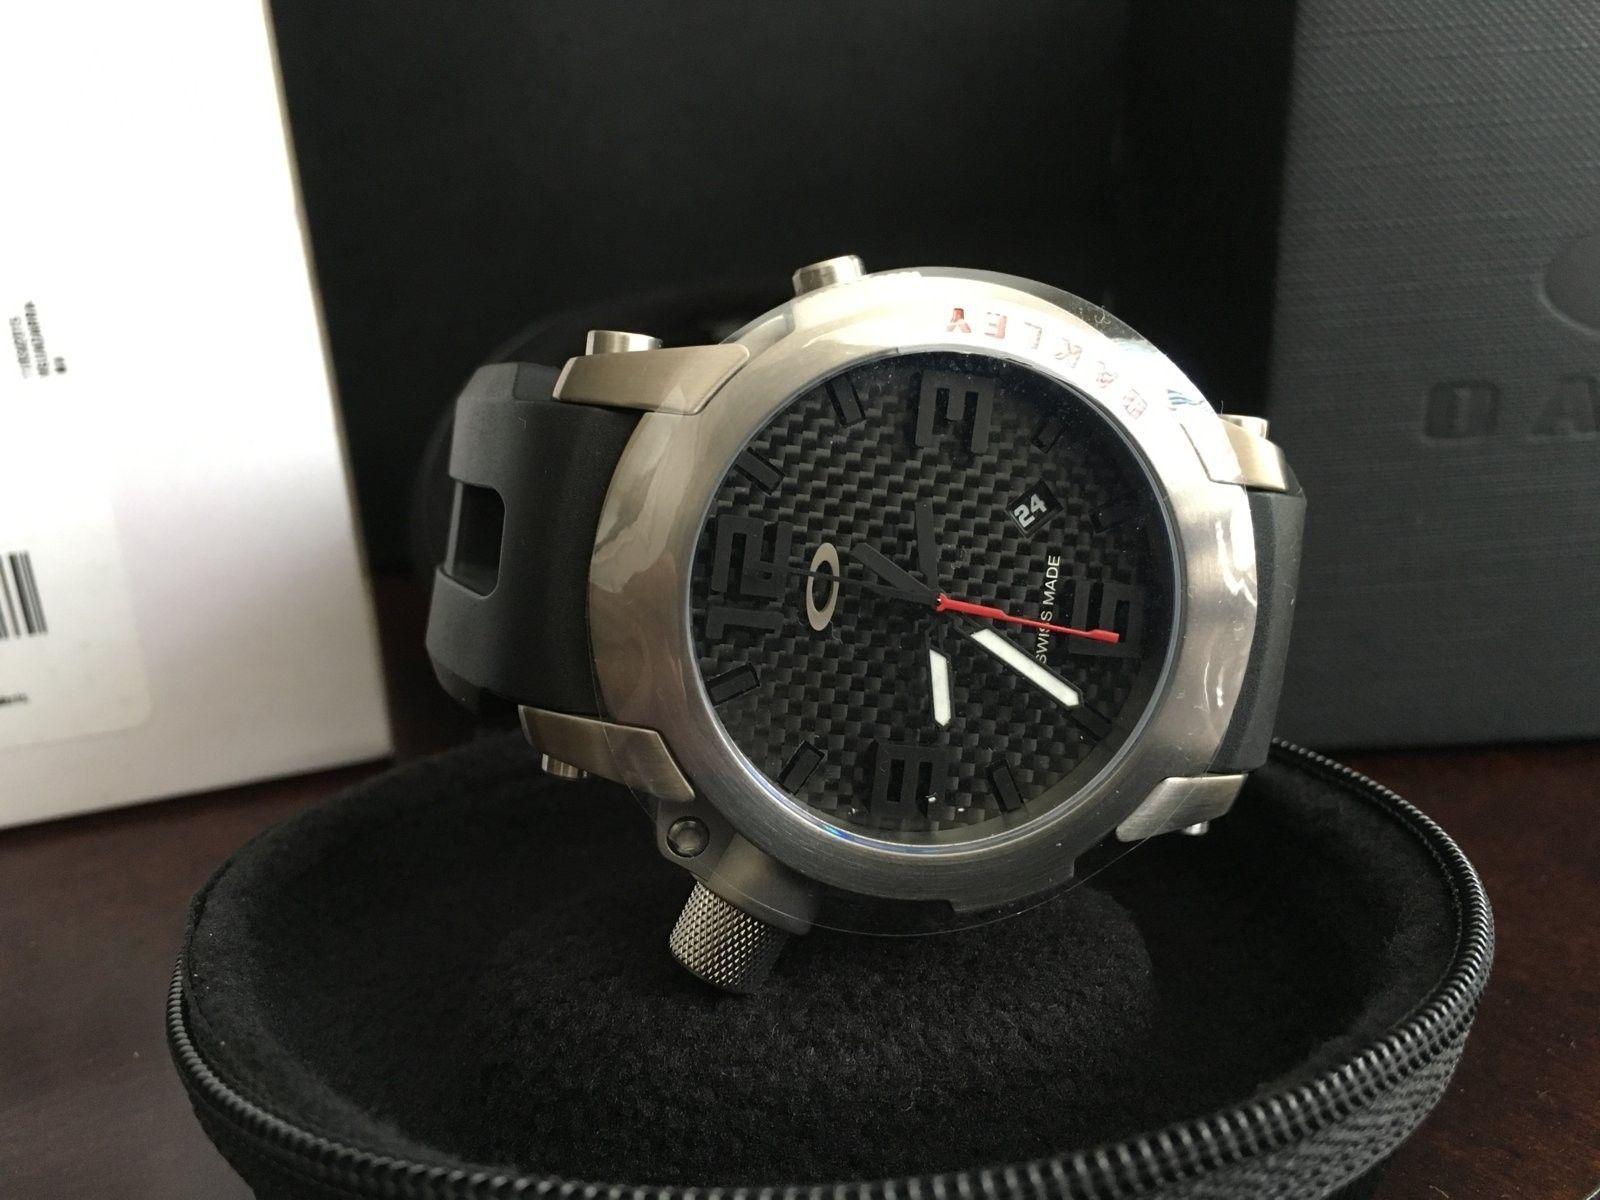 BNIB Holiday Titanium Killswitch Watch - IMG_1085.JPG